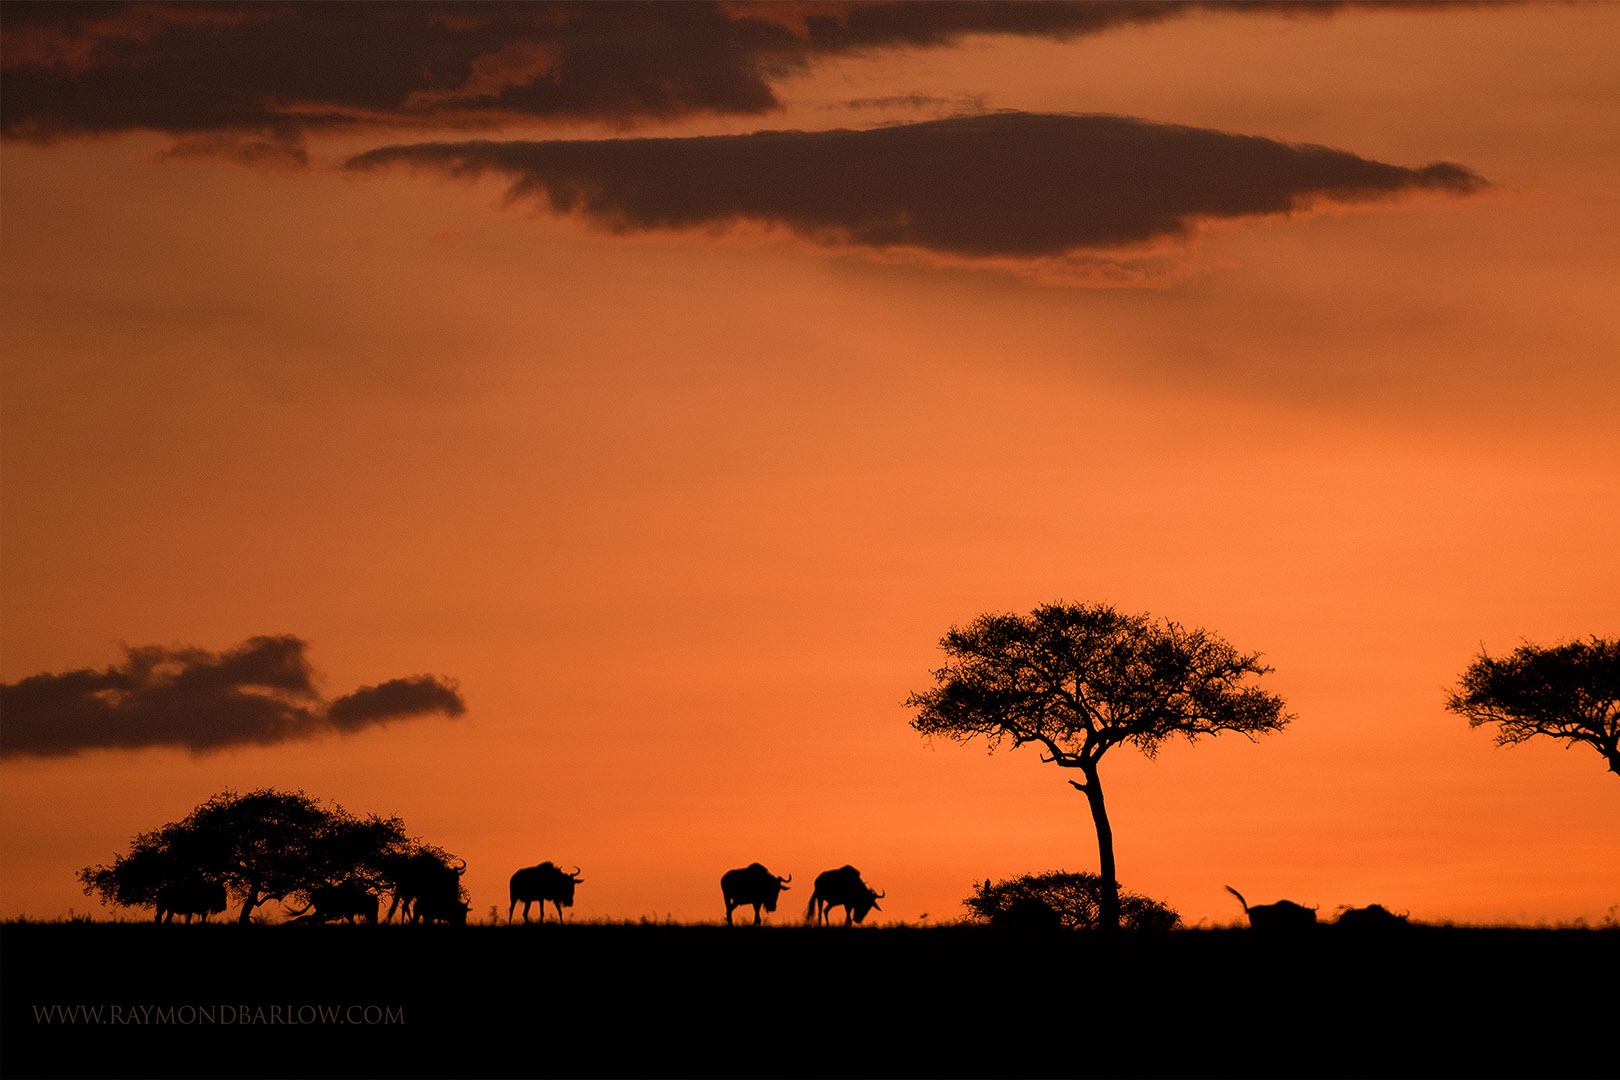 gallery-maasai-wanderings-safari-itineraries-signature-photo-safaris-africa-wildlife-sunset-trees